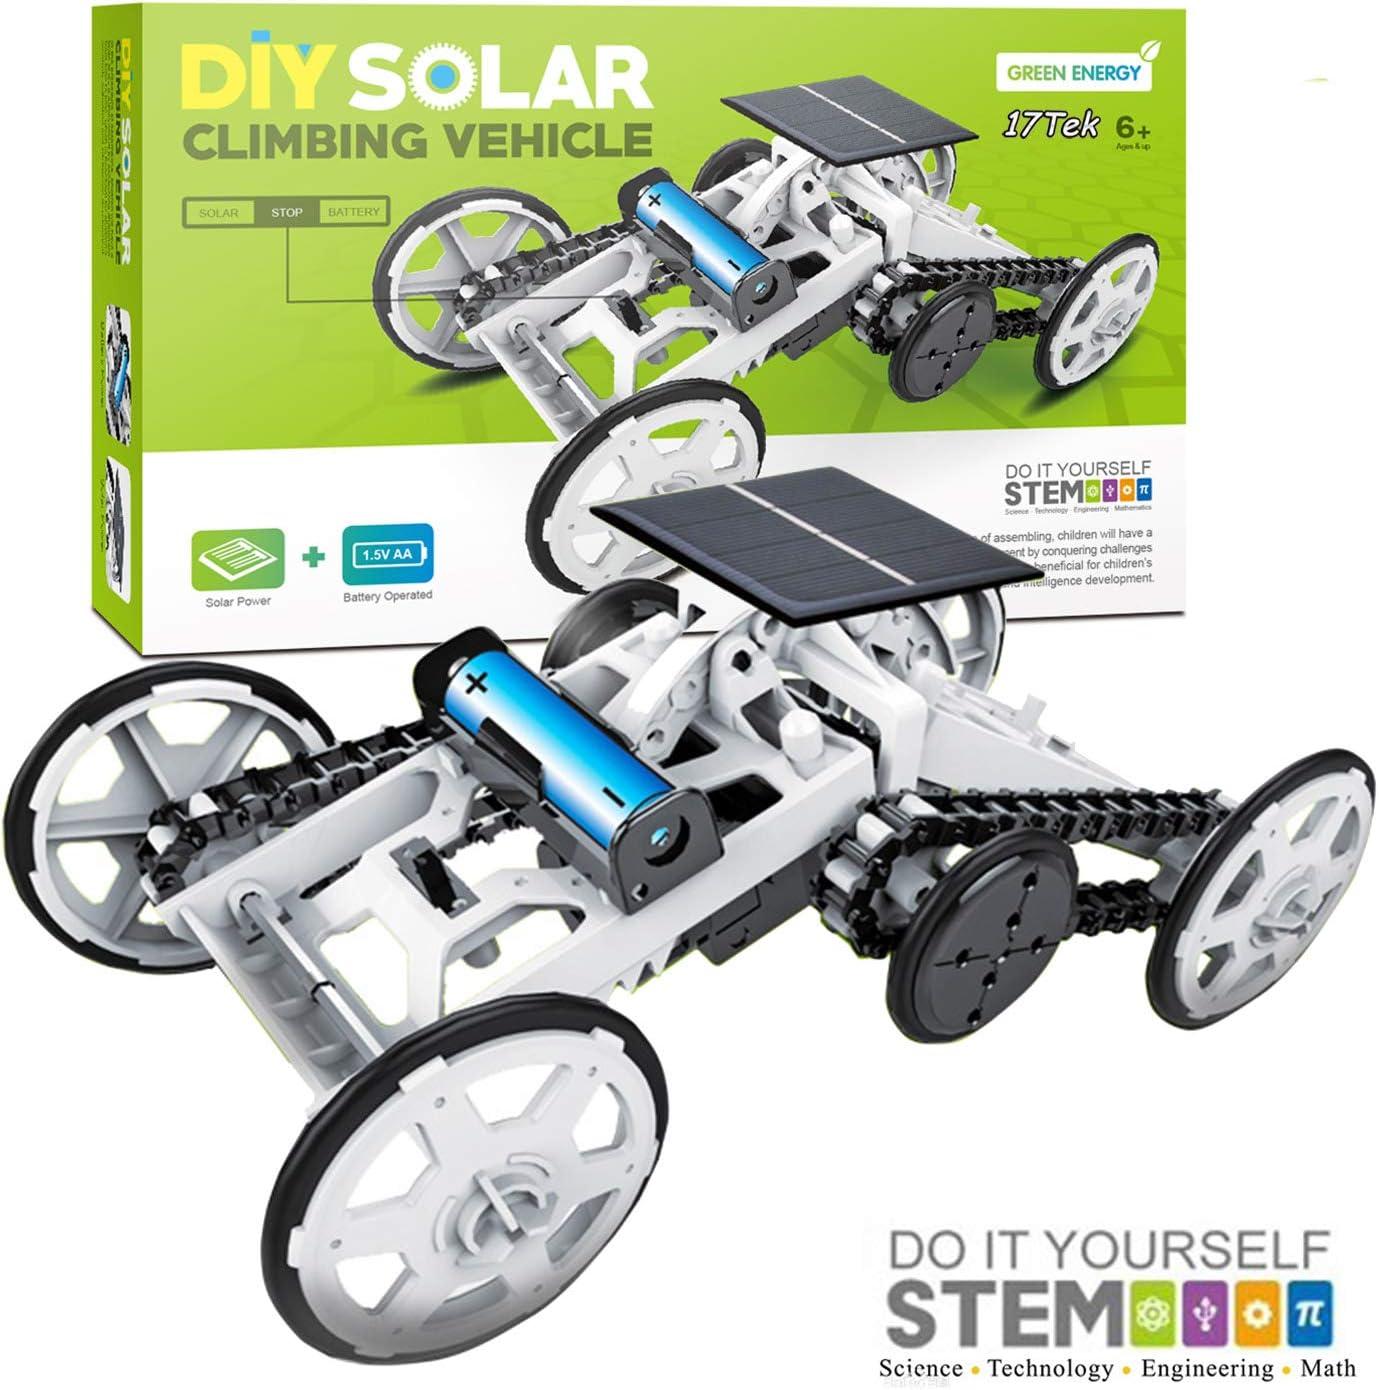 17Tek STEM Educational Solar Robot Green Energy DIY Science Solar Power Kits